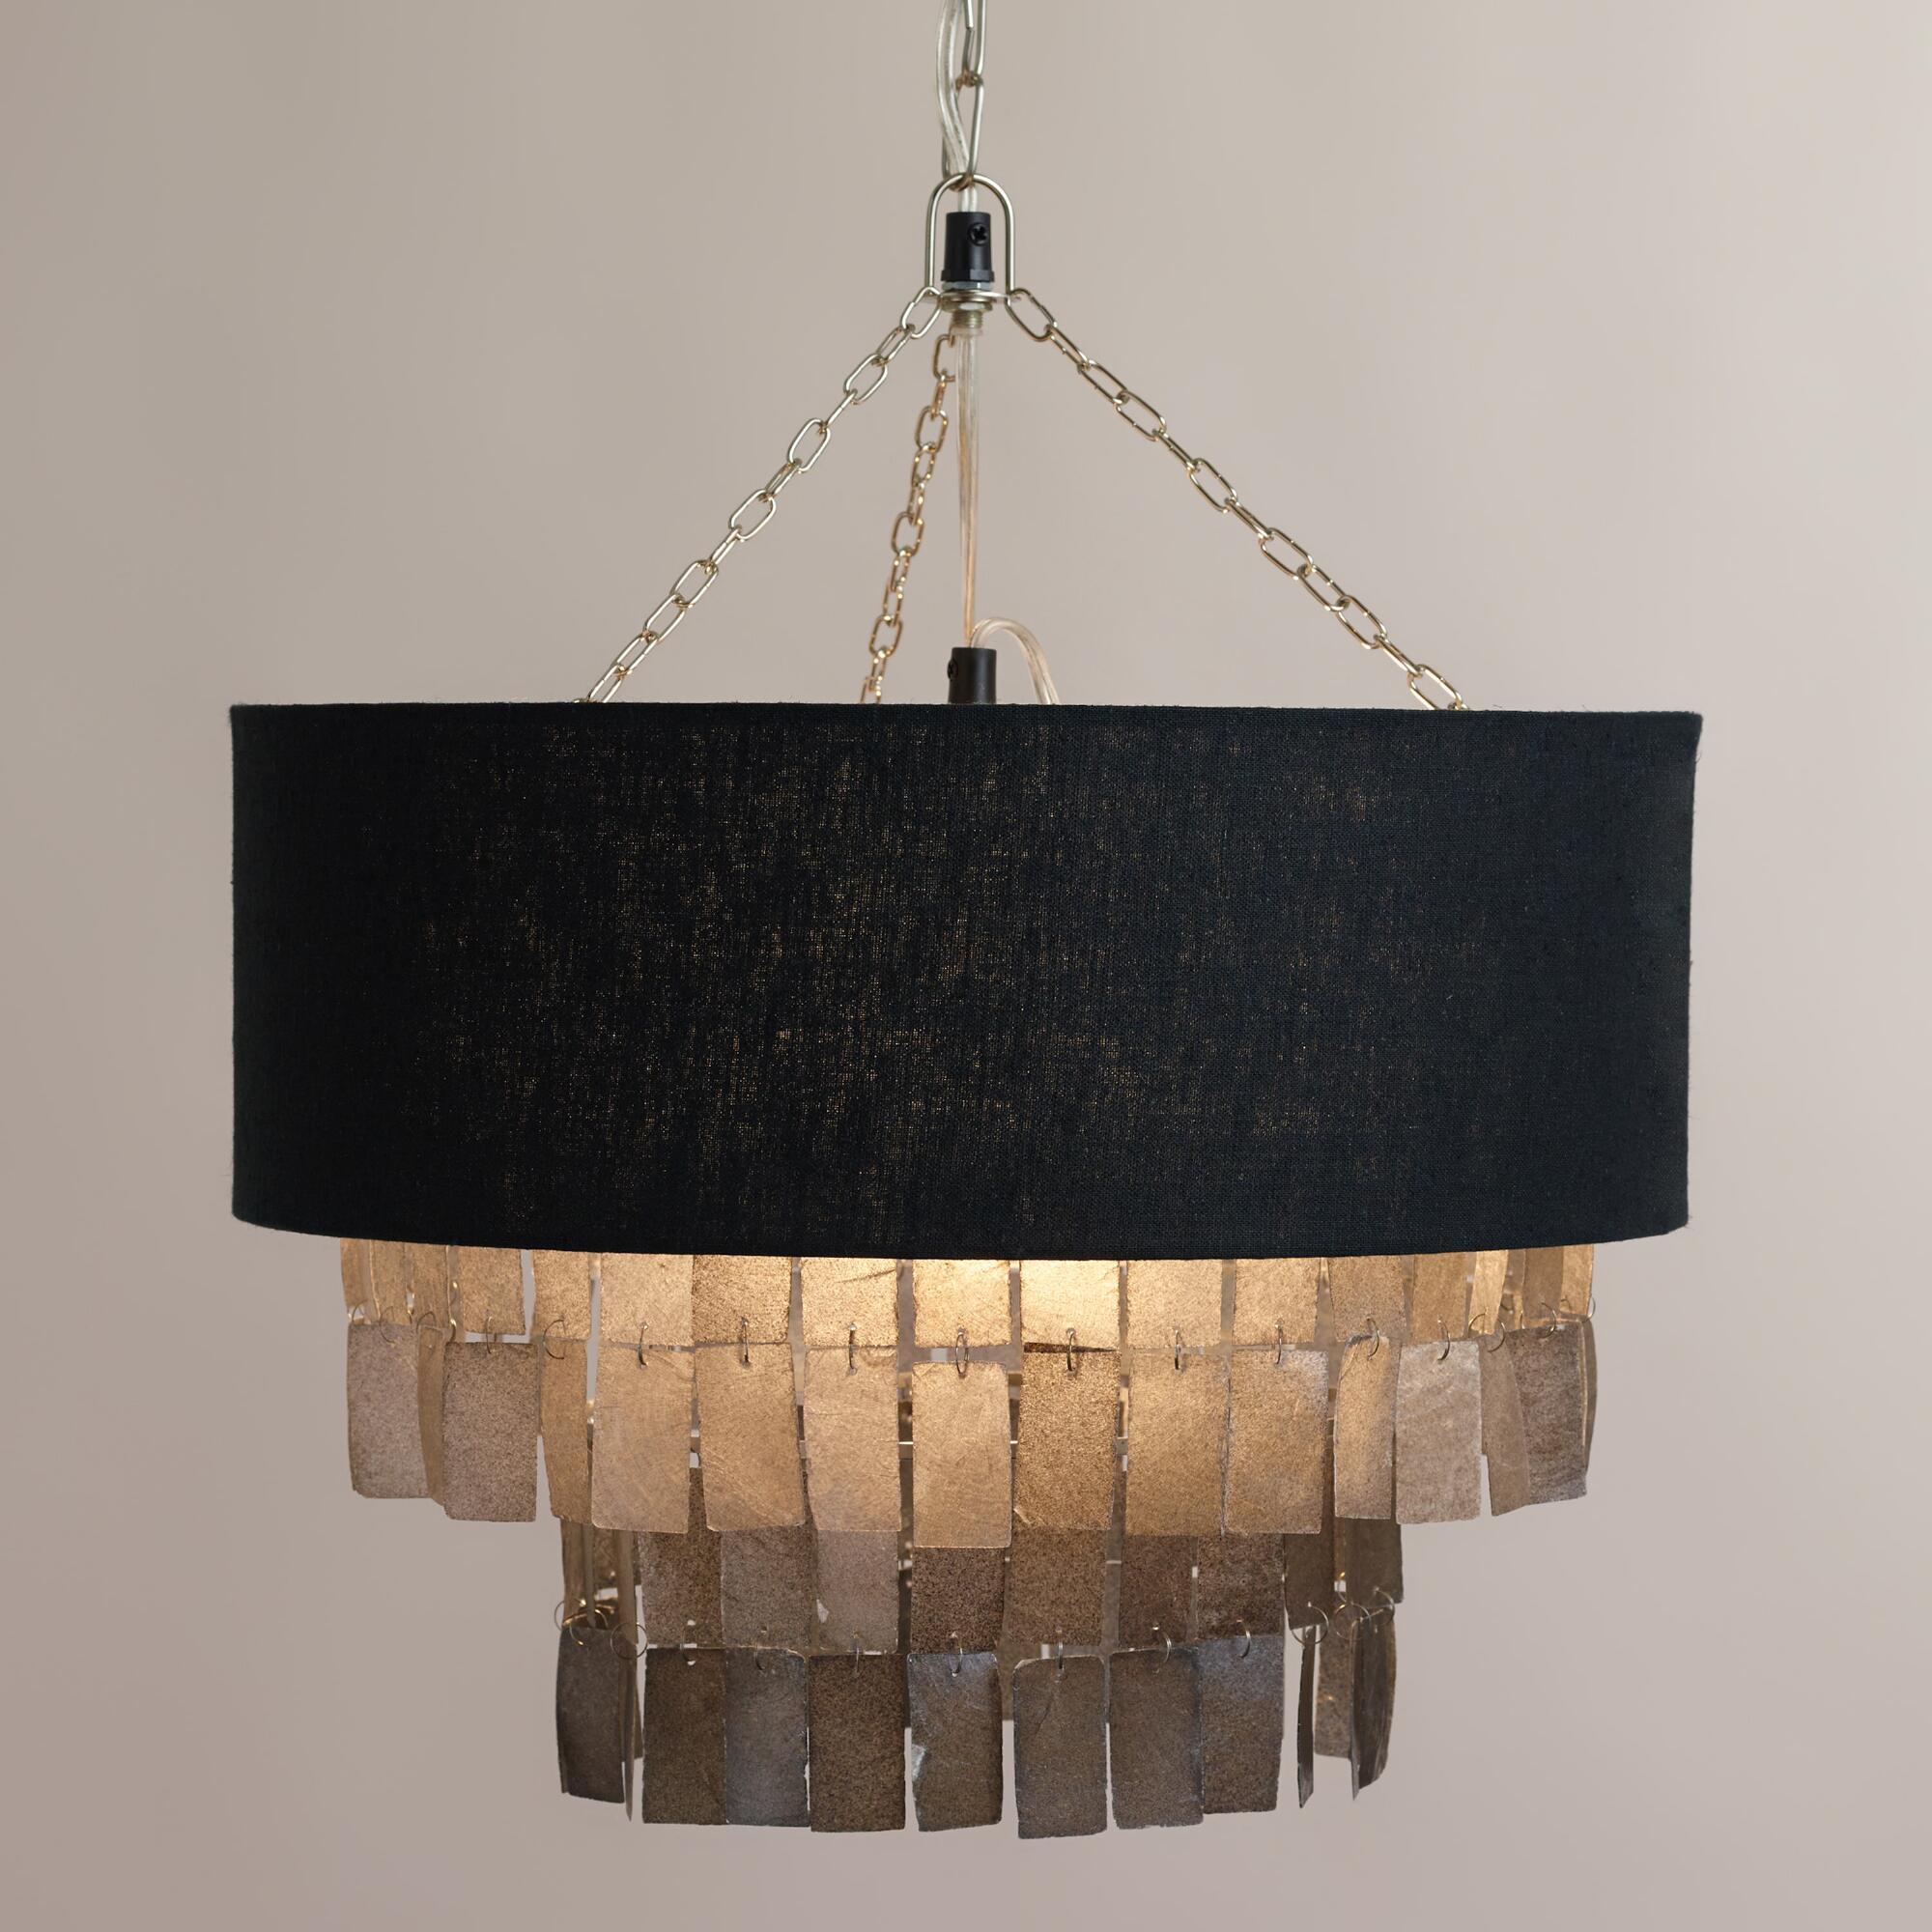 Charcoal Gray Capiz Linen Pendant L&... by World Market/Cost Plus | Havenly & Charcoal Gray Capiz Linen Pendant Lamp... by World Market/Cost ... azcodes.com